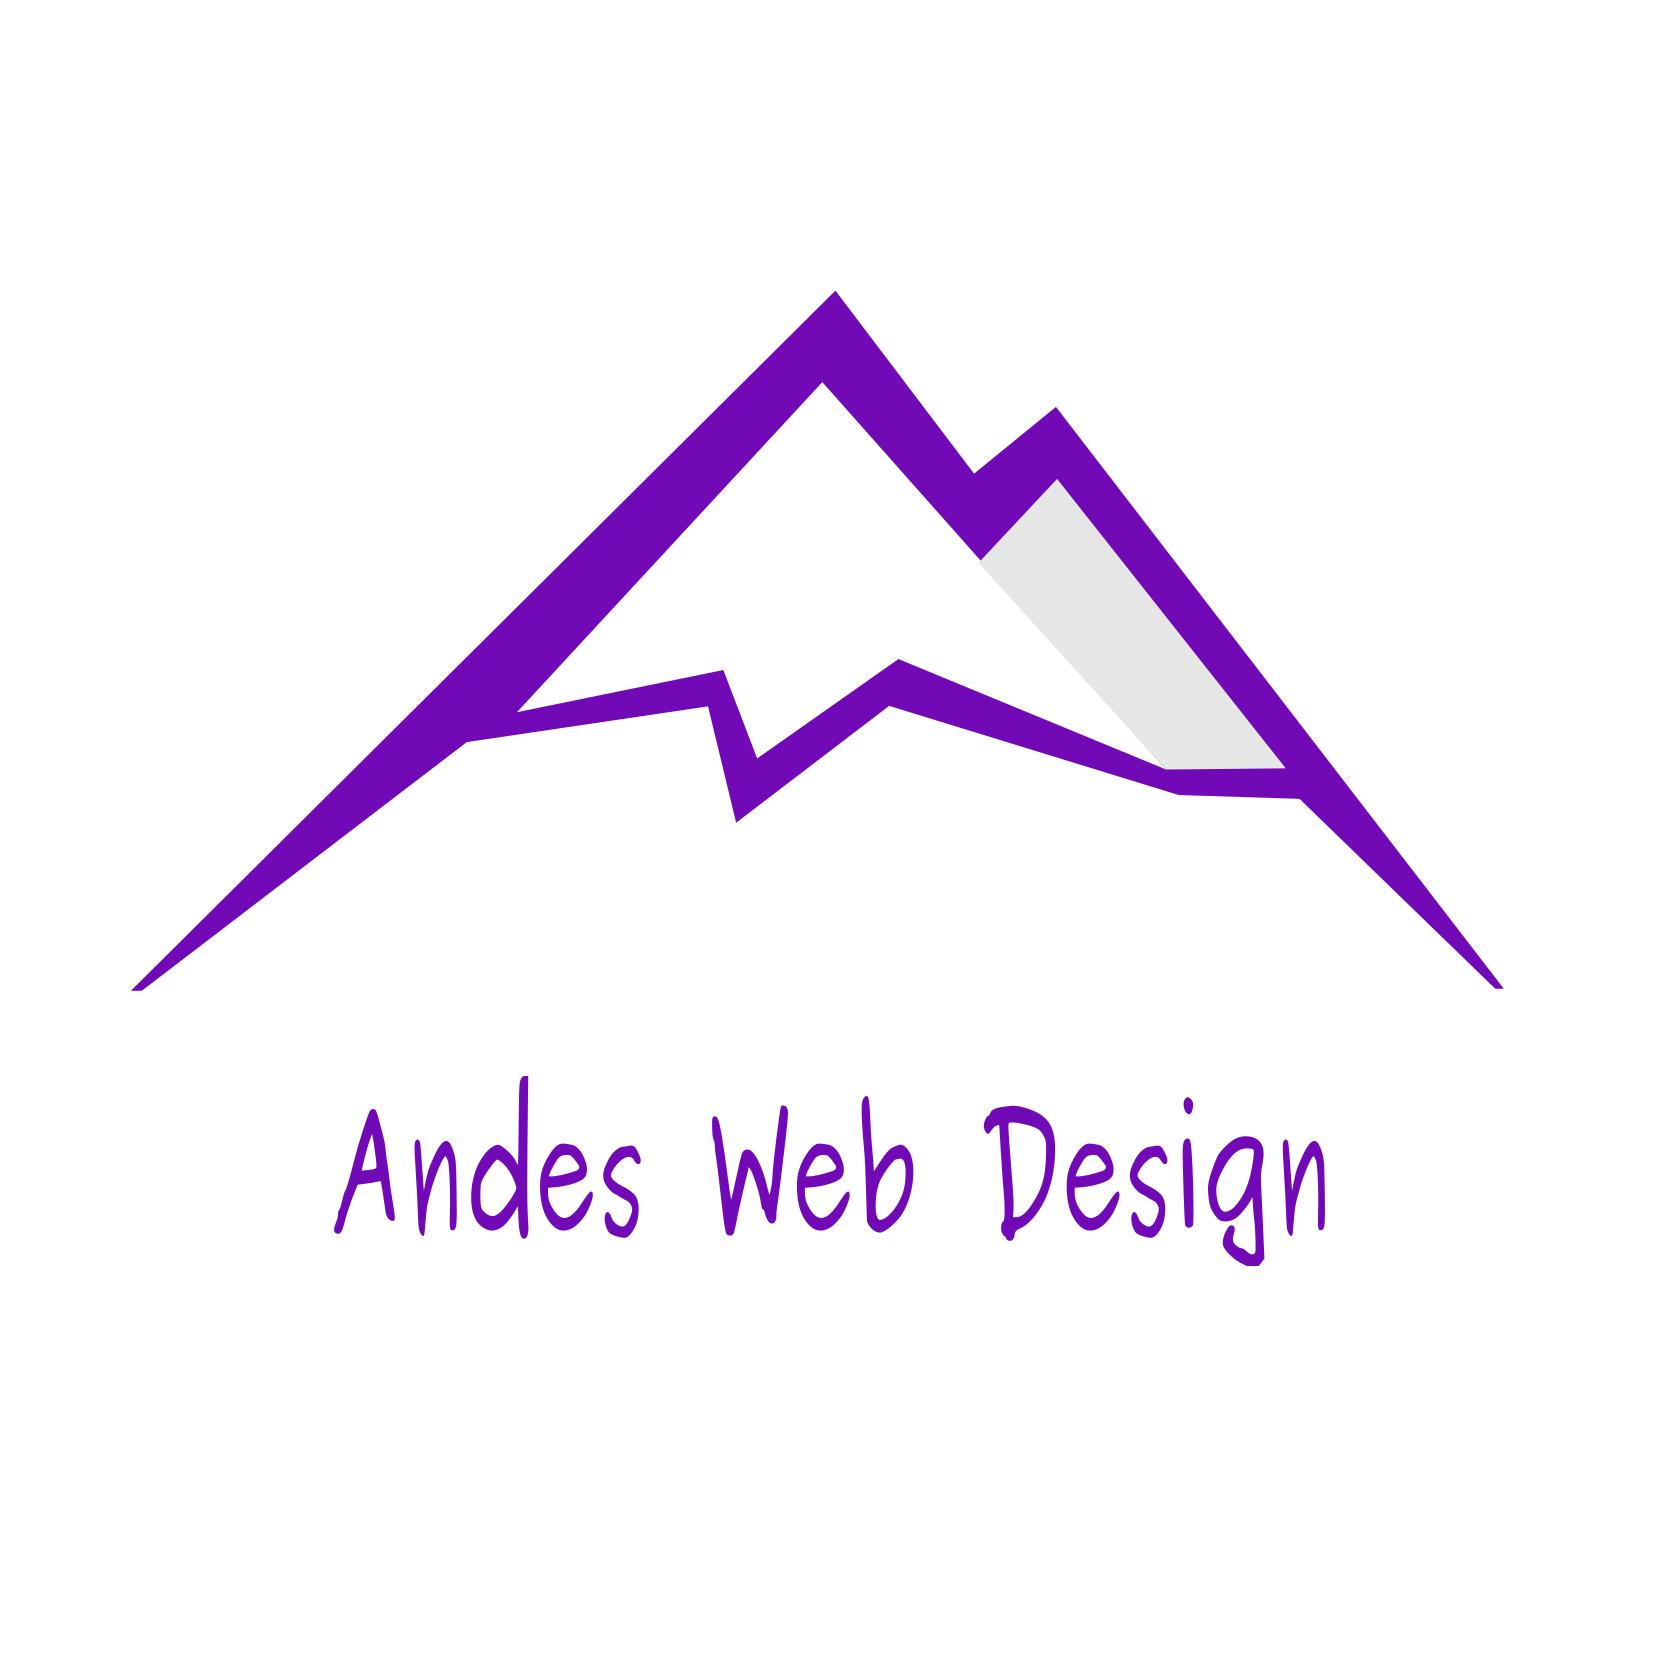 andeswebdesign